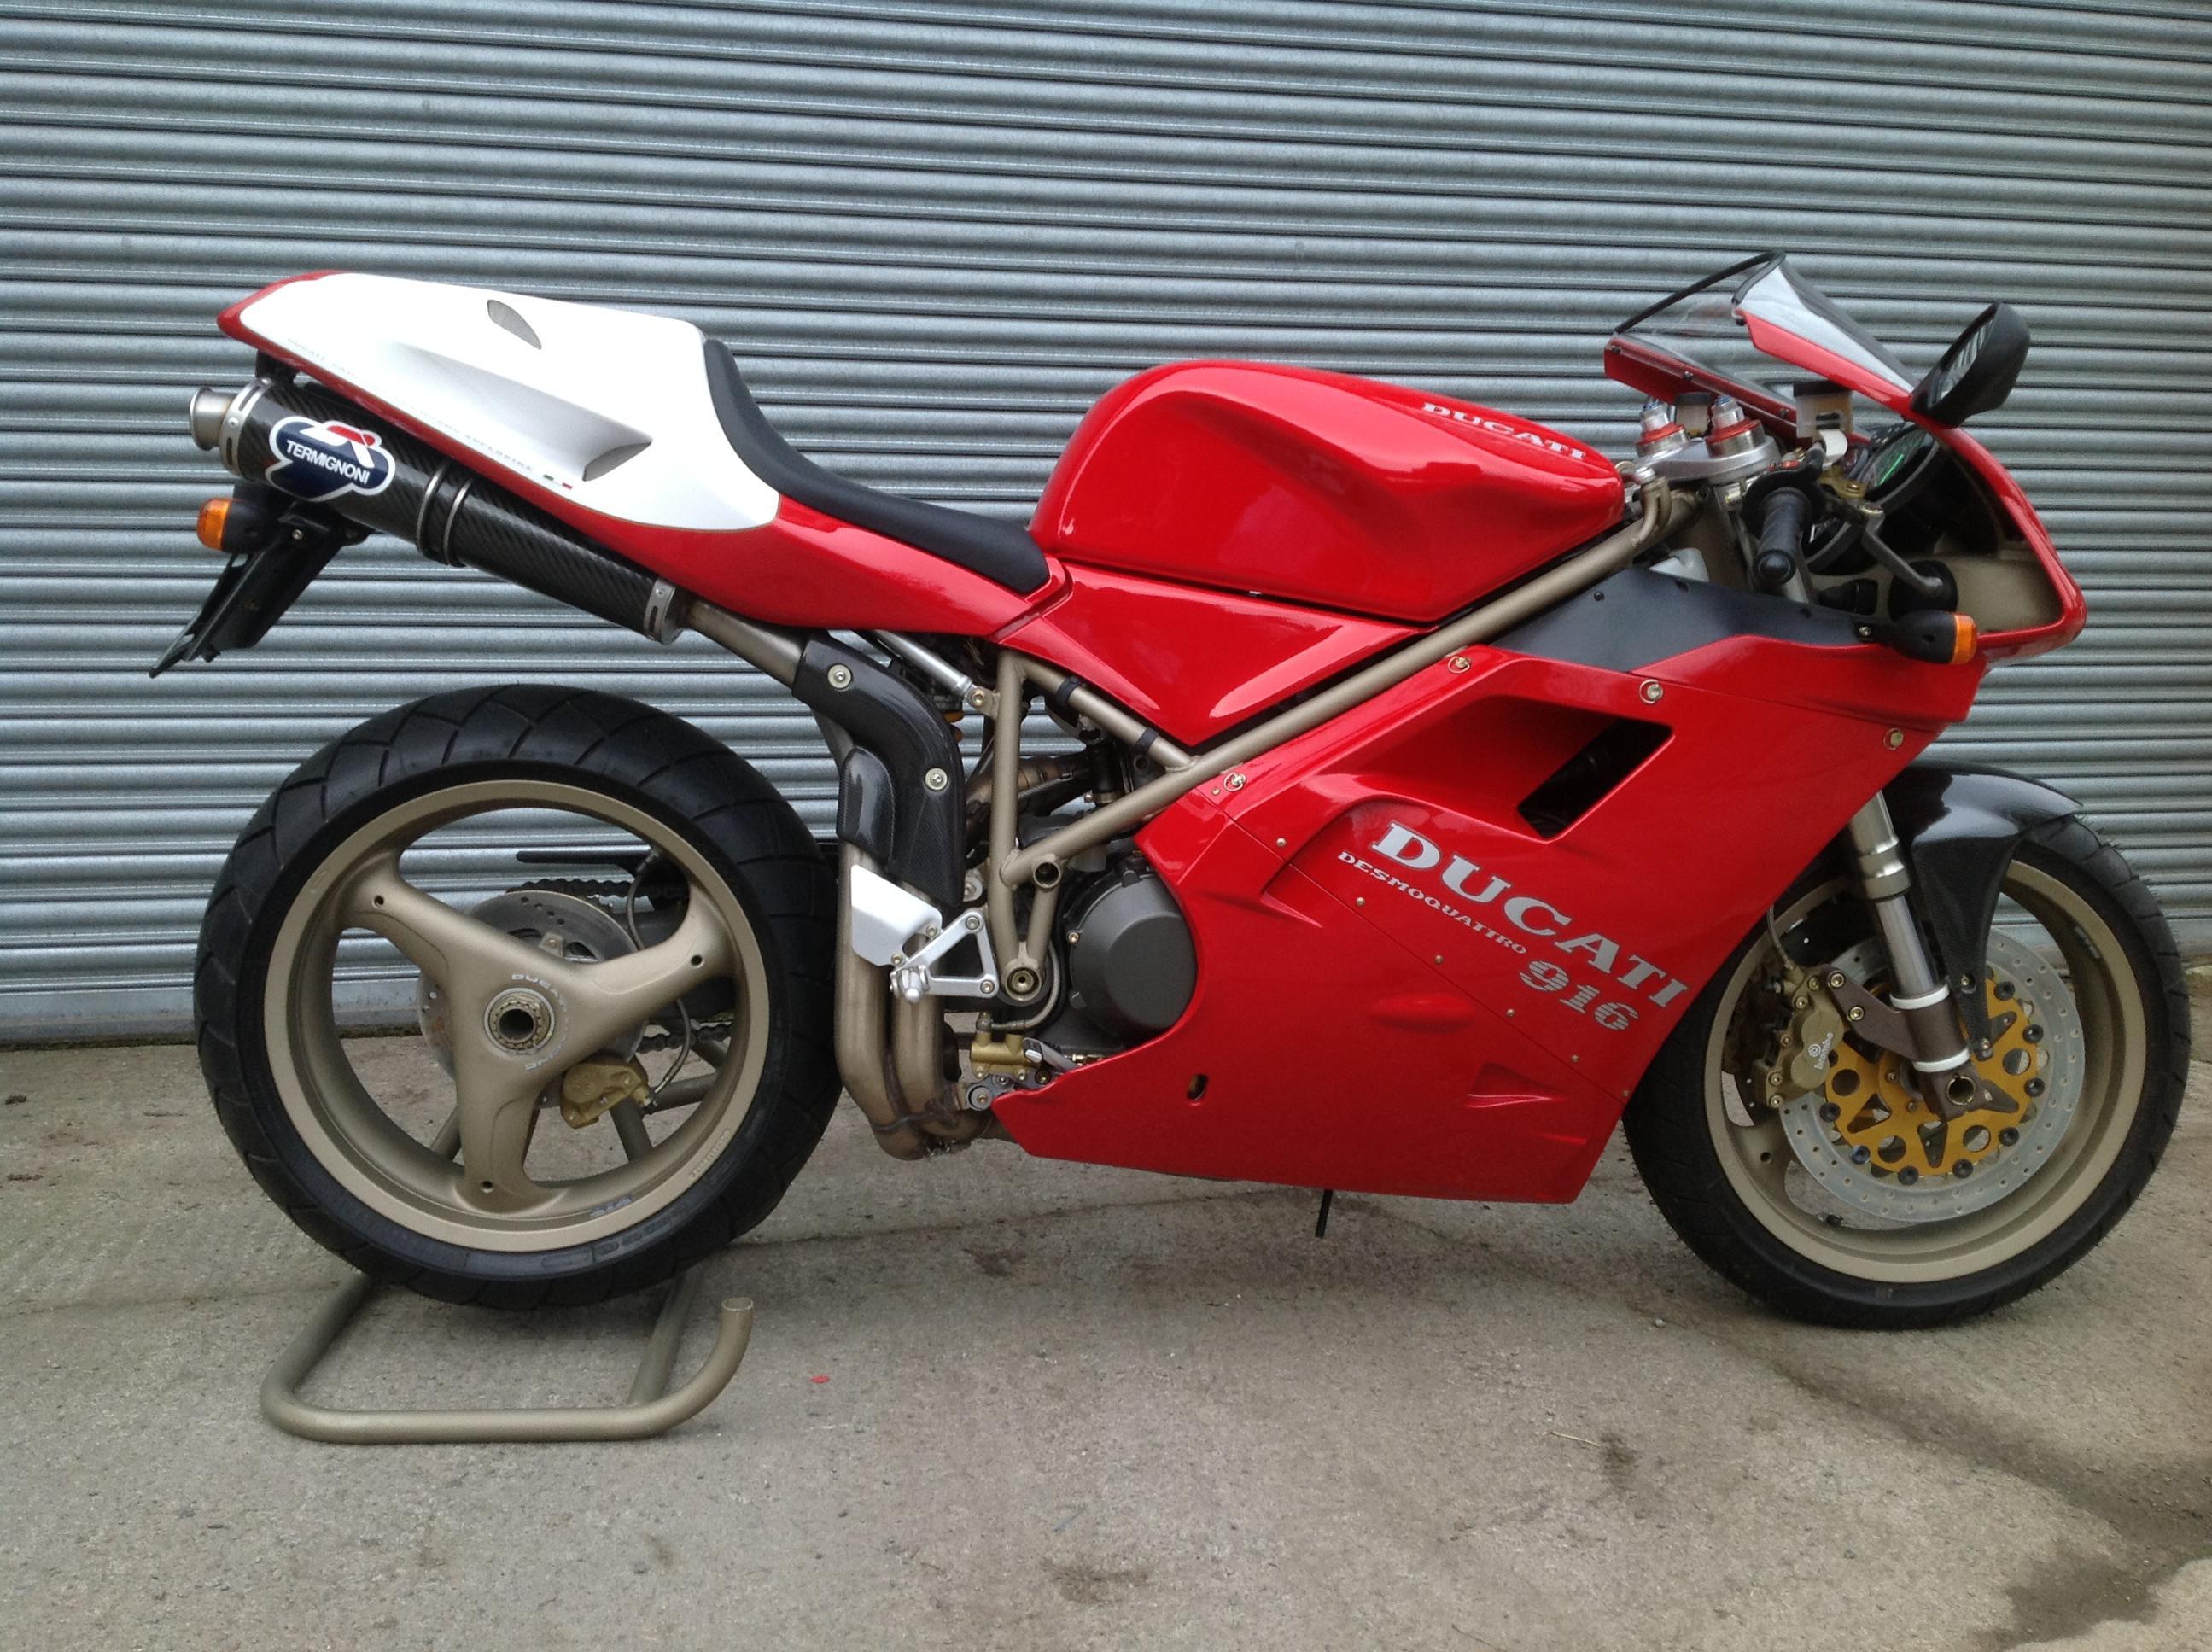 Unridden 1997 Ducati 916 Sps Ducatiorg Forum The Home